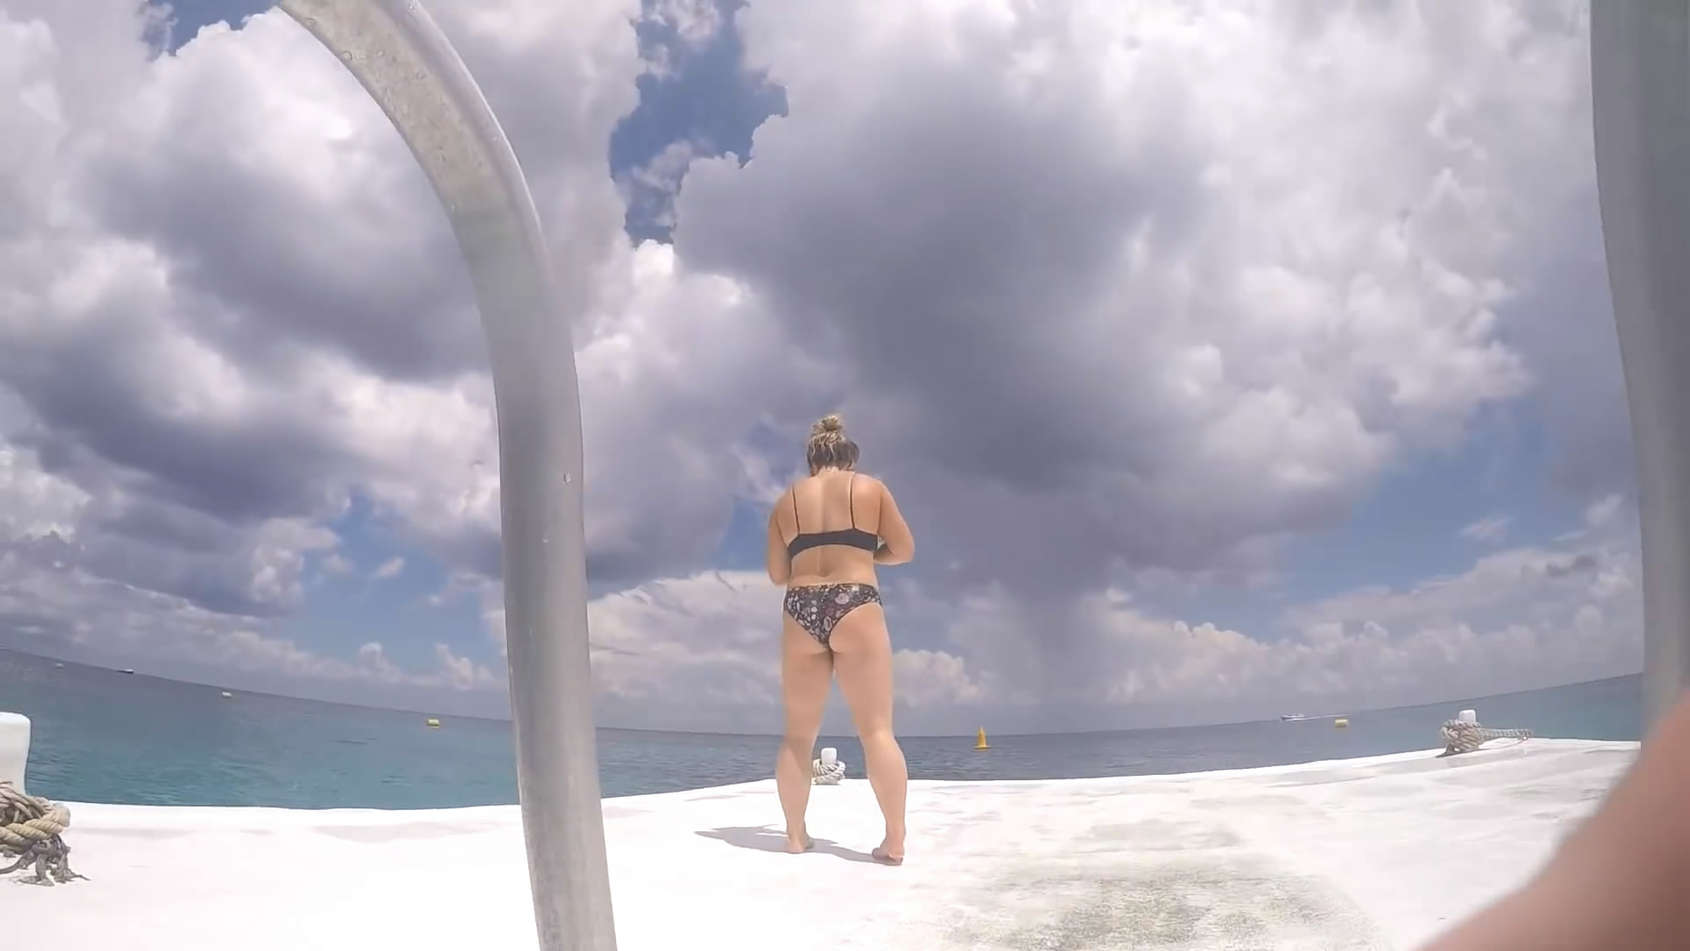 Sexy miley cyrus bikini beach yoga girl in costa rica 2013 - 3 part 9